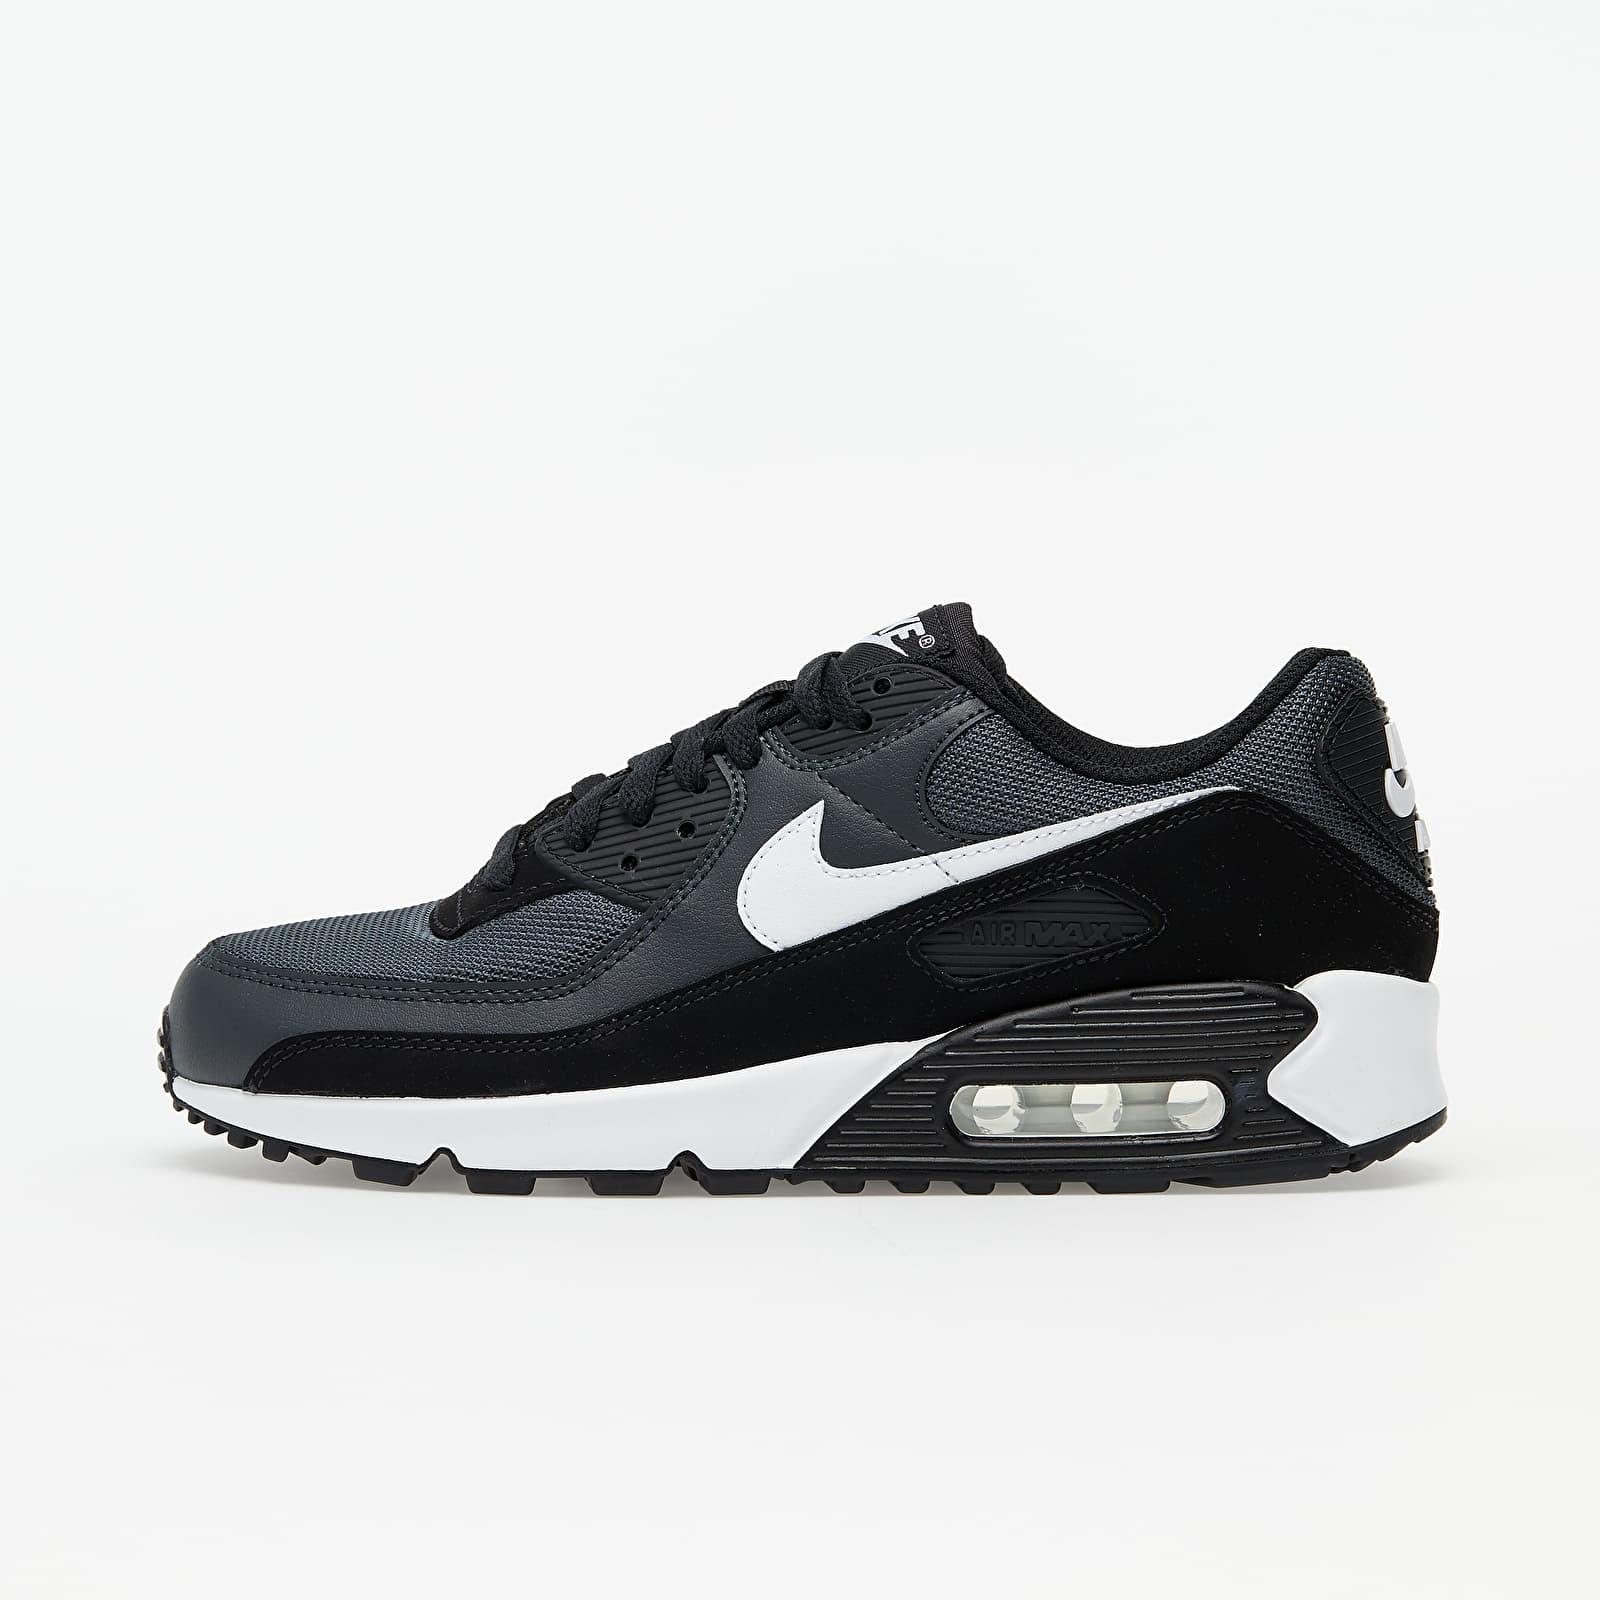 Nike Air Max 90 Iron Grey/ White-Dk Smoke Grey-Black EUR 44